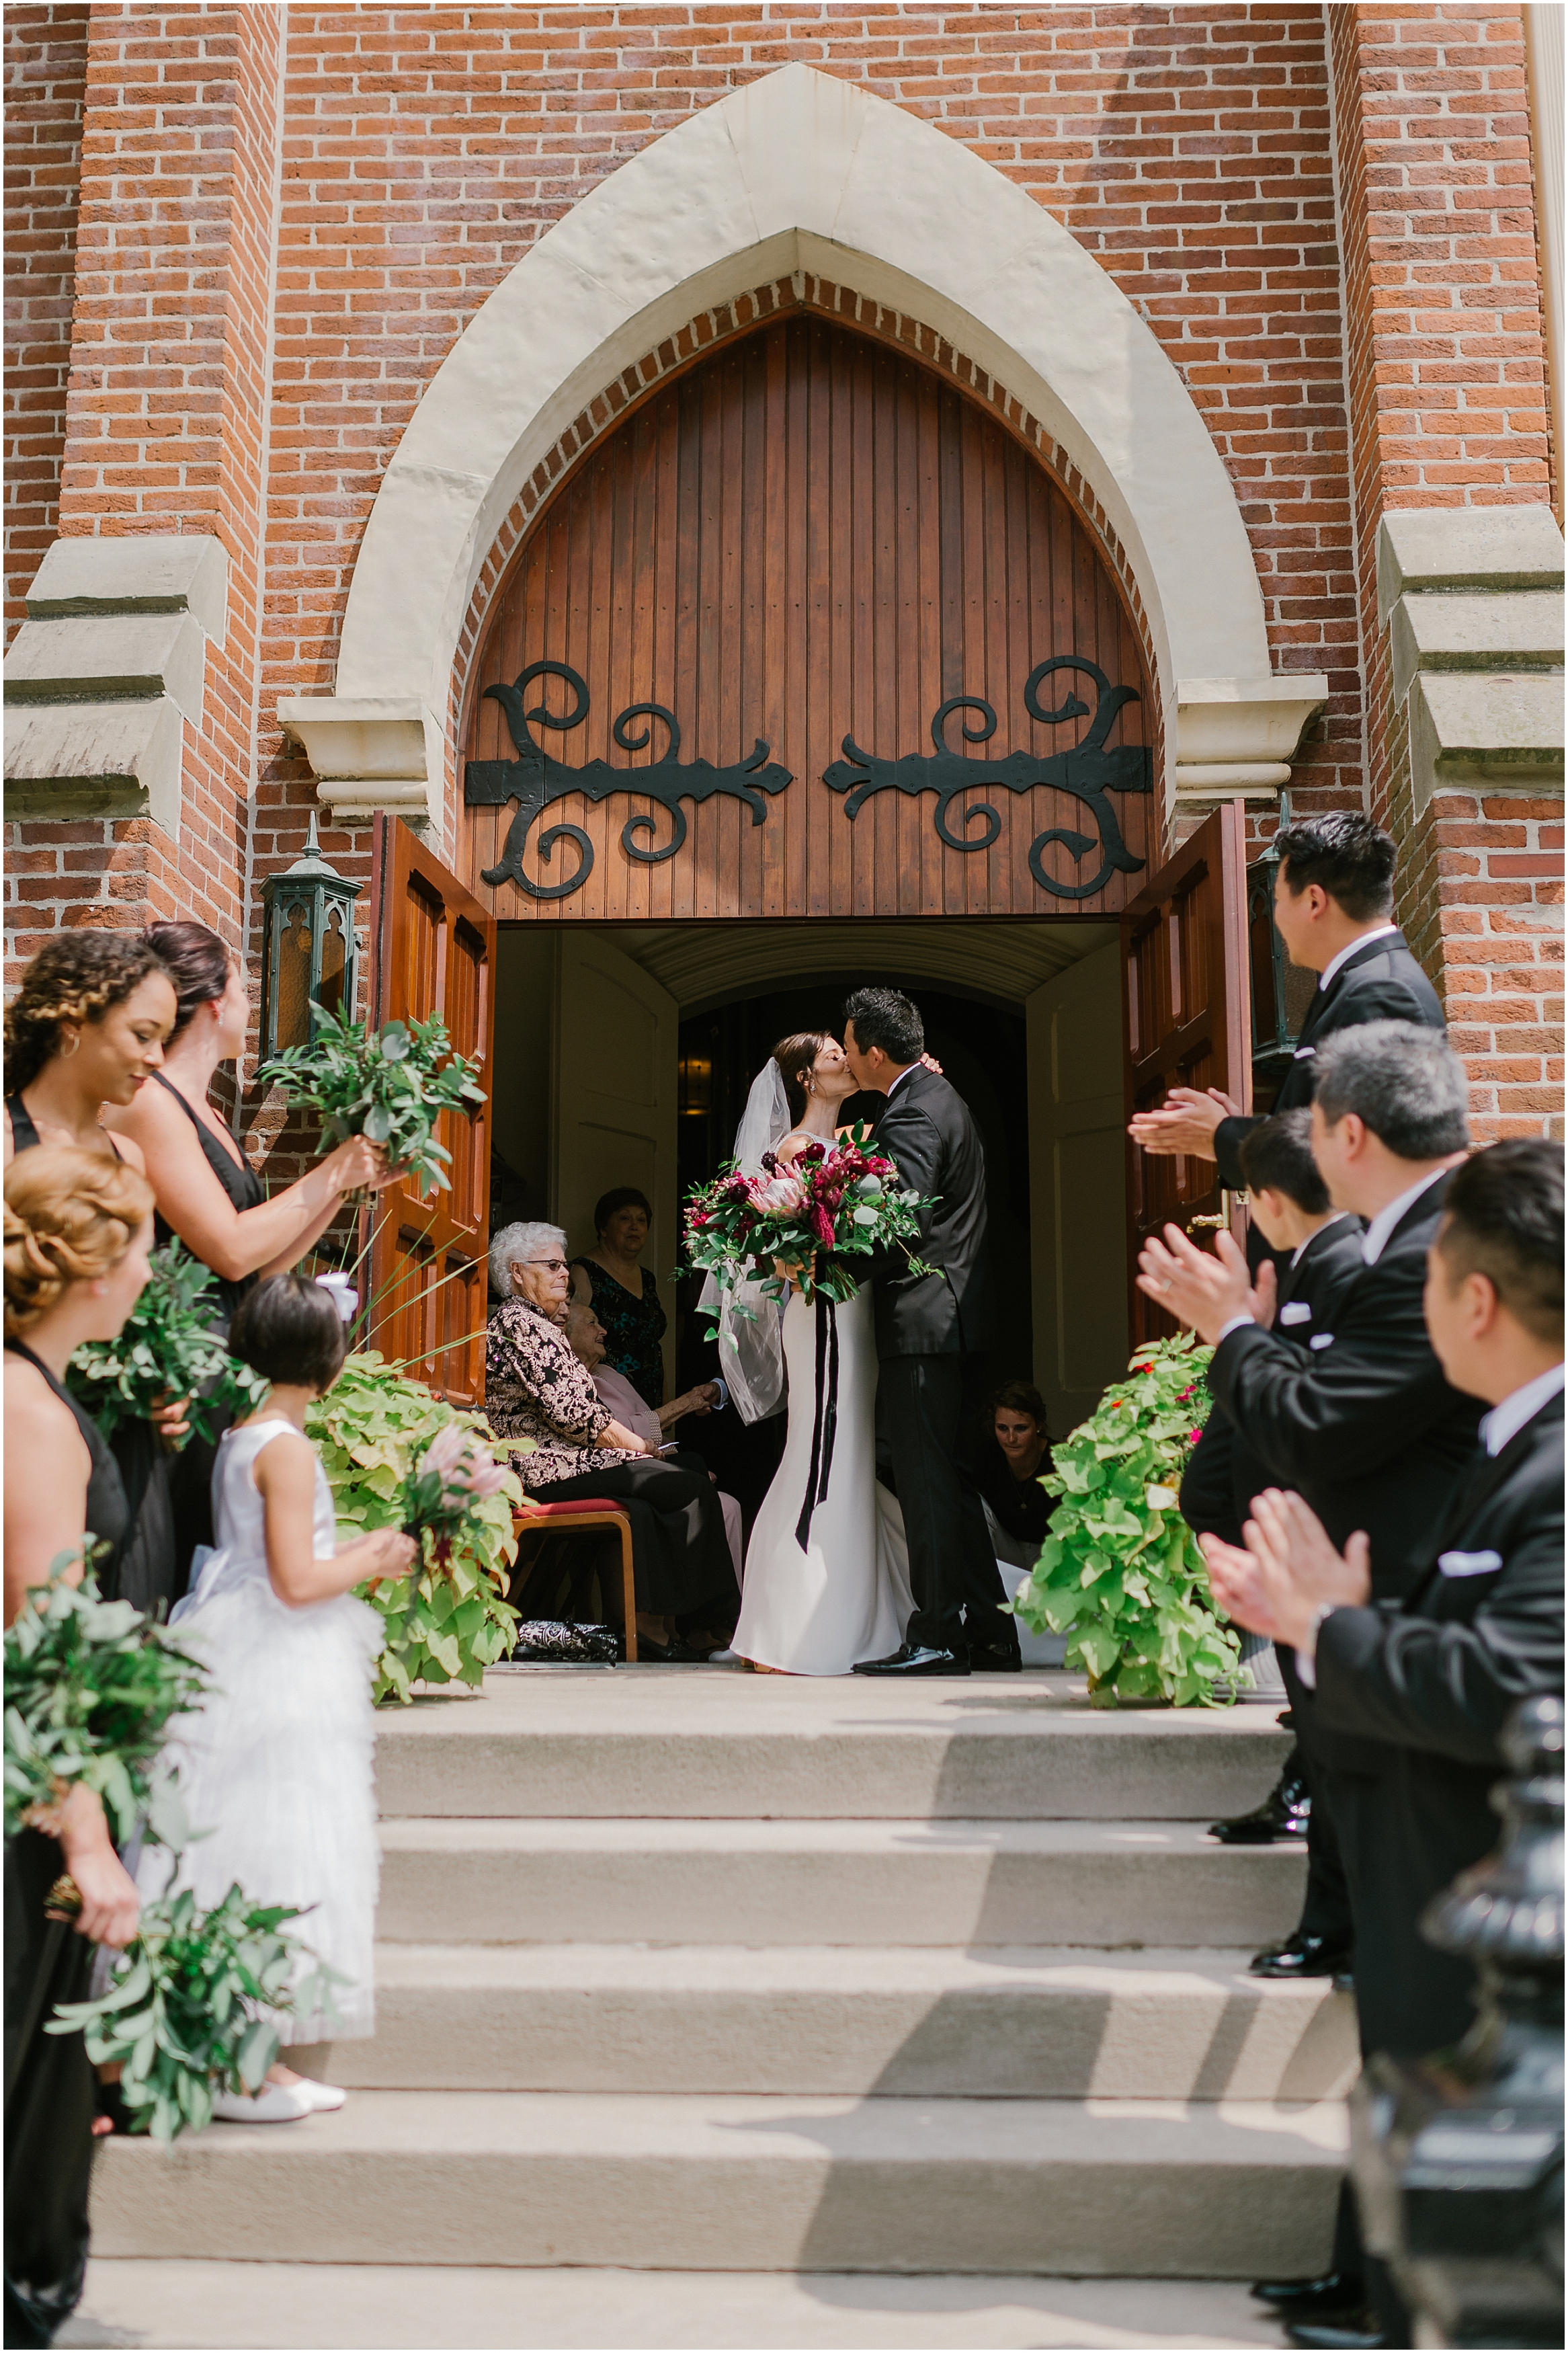 Rebecca_Shehorn_Photography_Indianapolis Wedding Photographer Sycamore at Mallow Run Wedding_9734.jpg